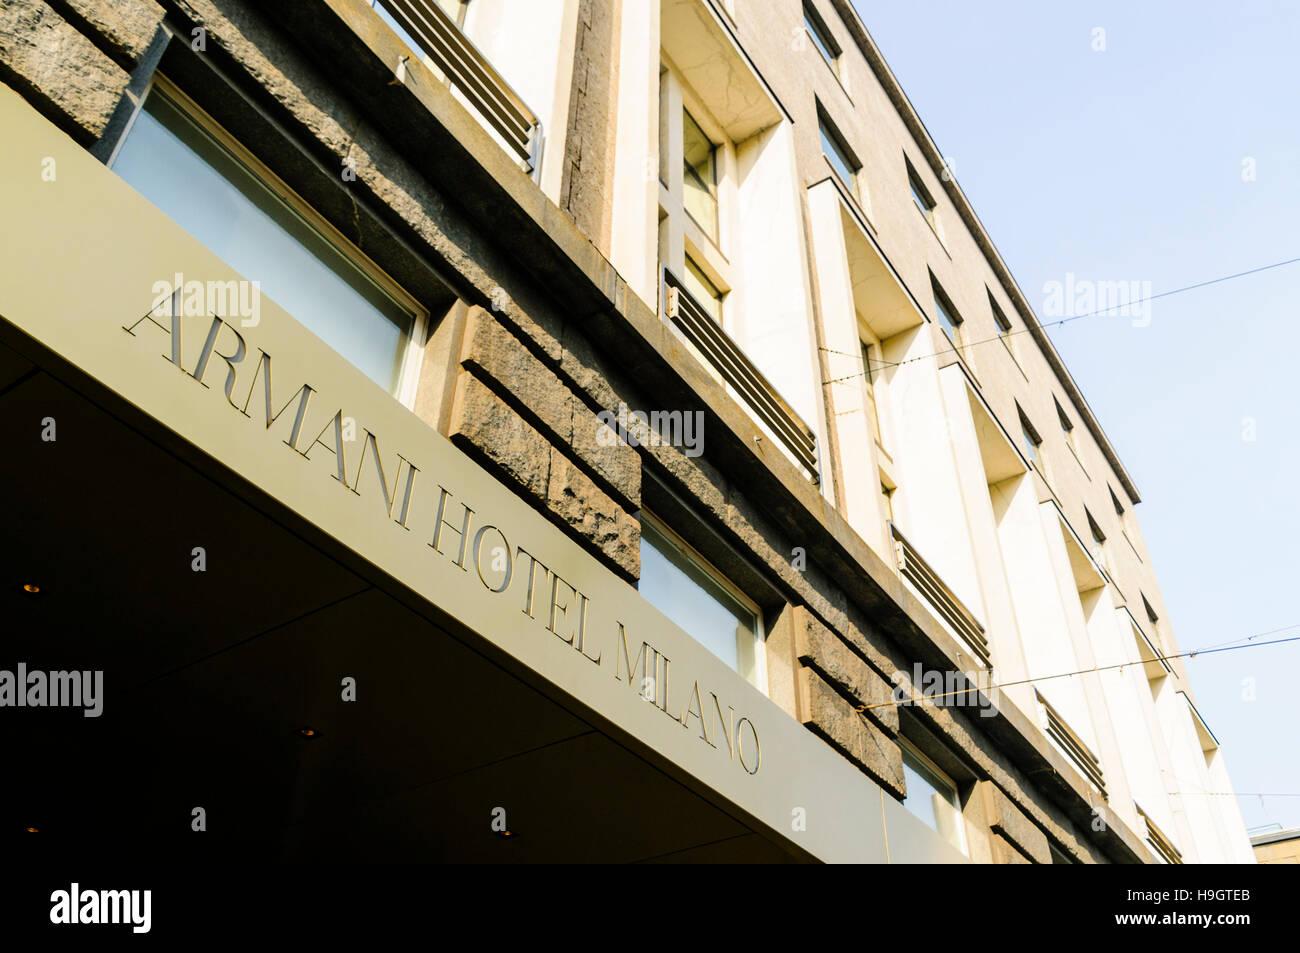 Armani Hotel Milano, Milan, Italy - Stock Image